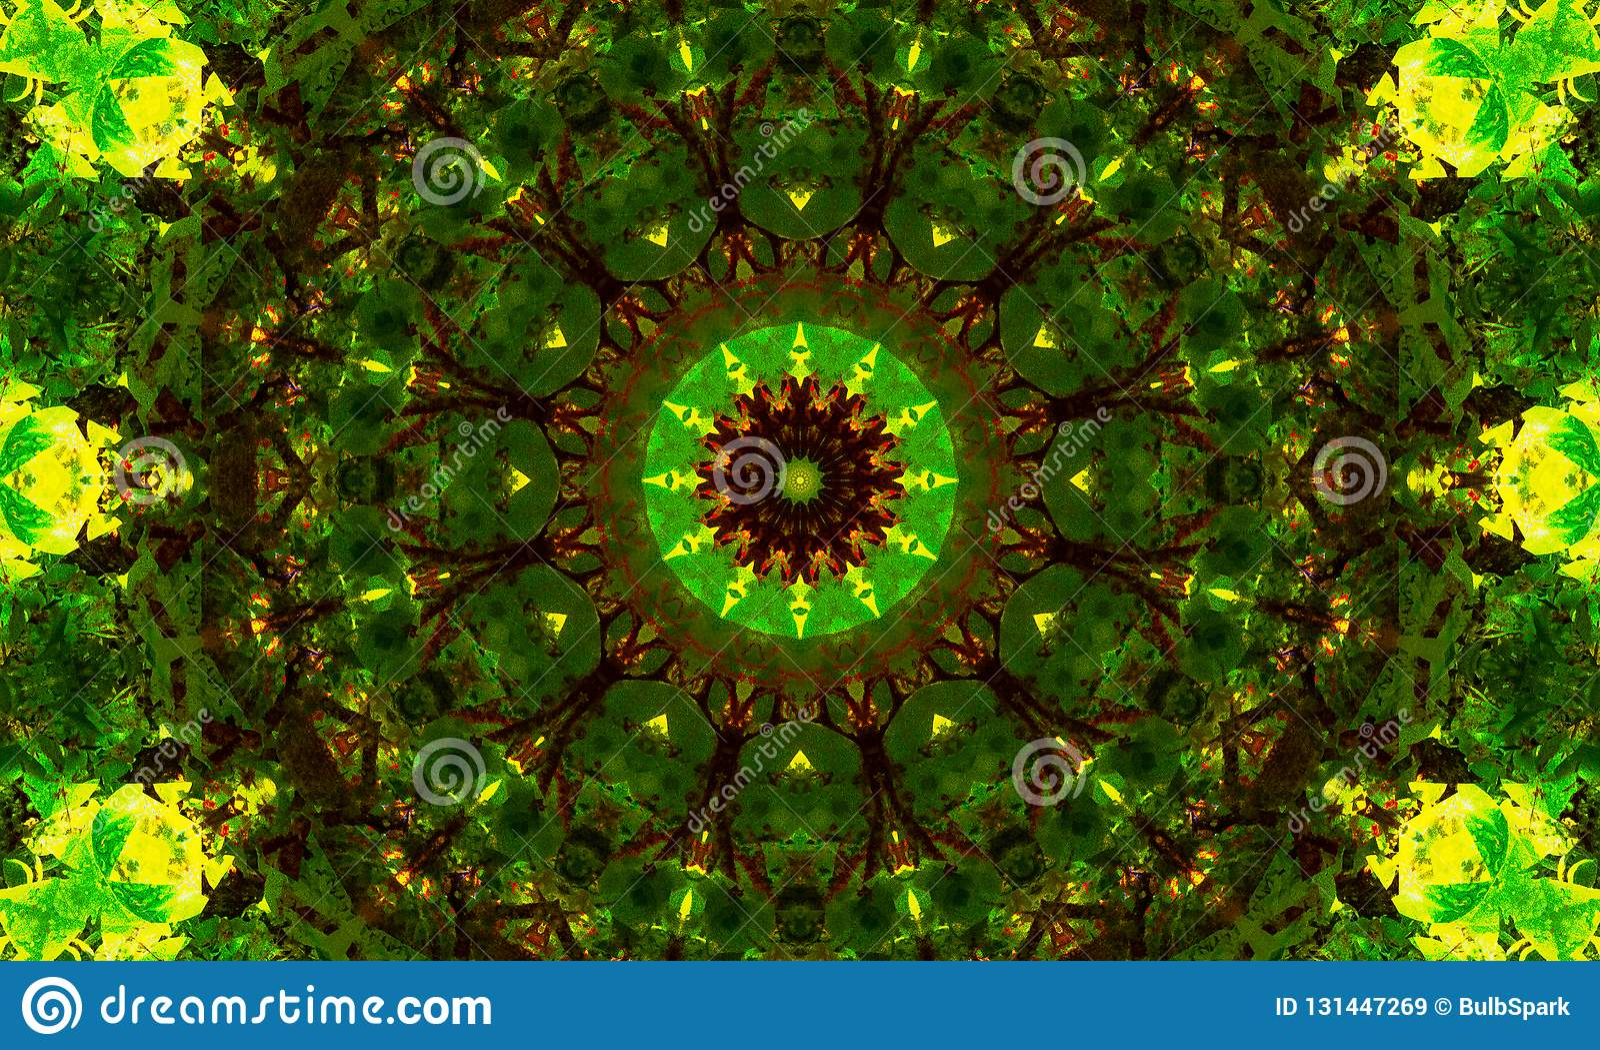 Mandala Art With Many Shades Of Green Stock Illustration Illustration Of Pattern Graphic 131447269